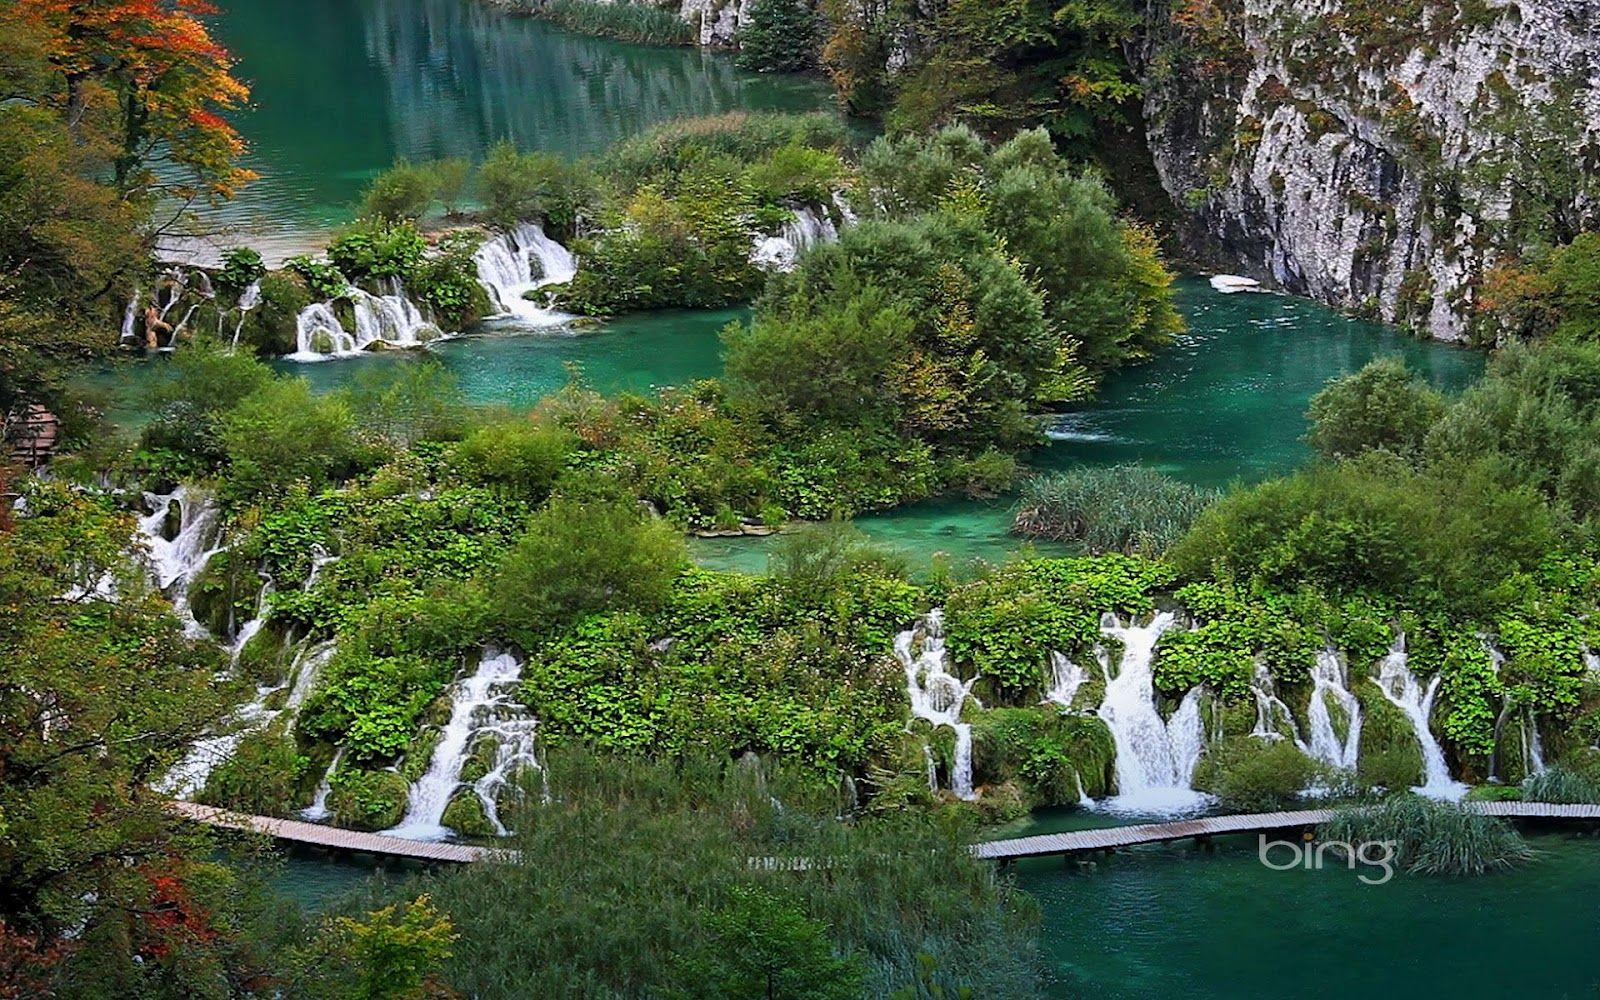 Plitvice Lakes National Park Plitvice Lakes National